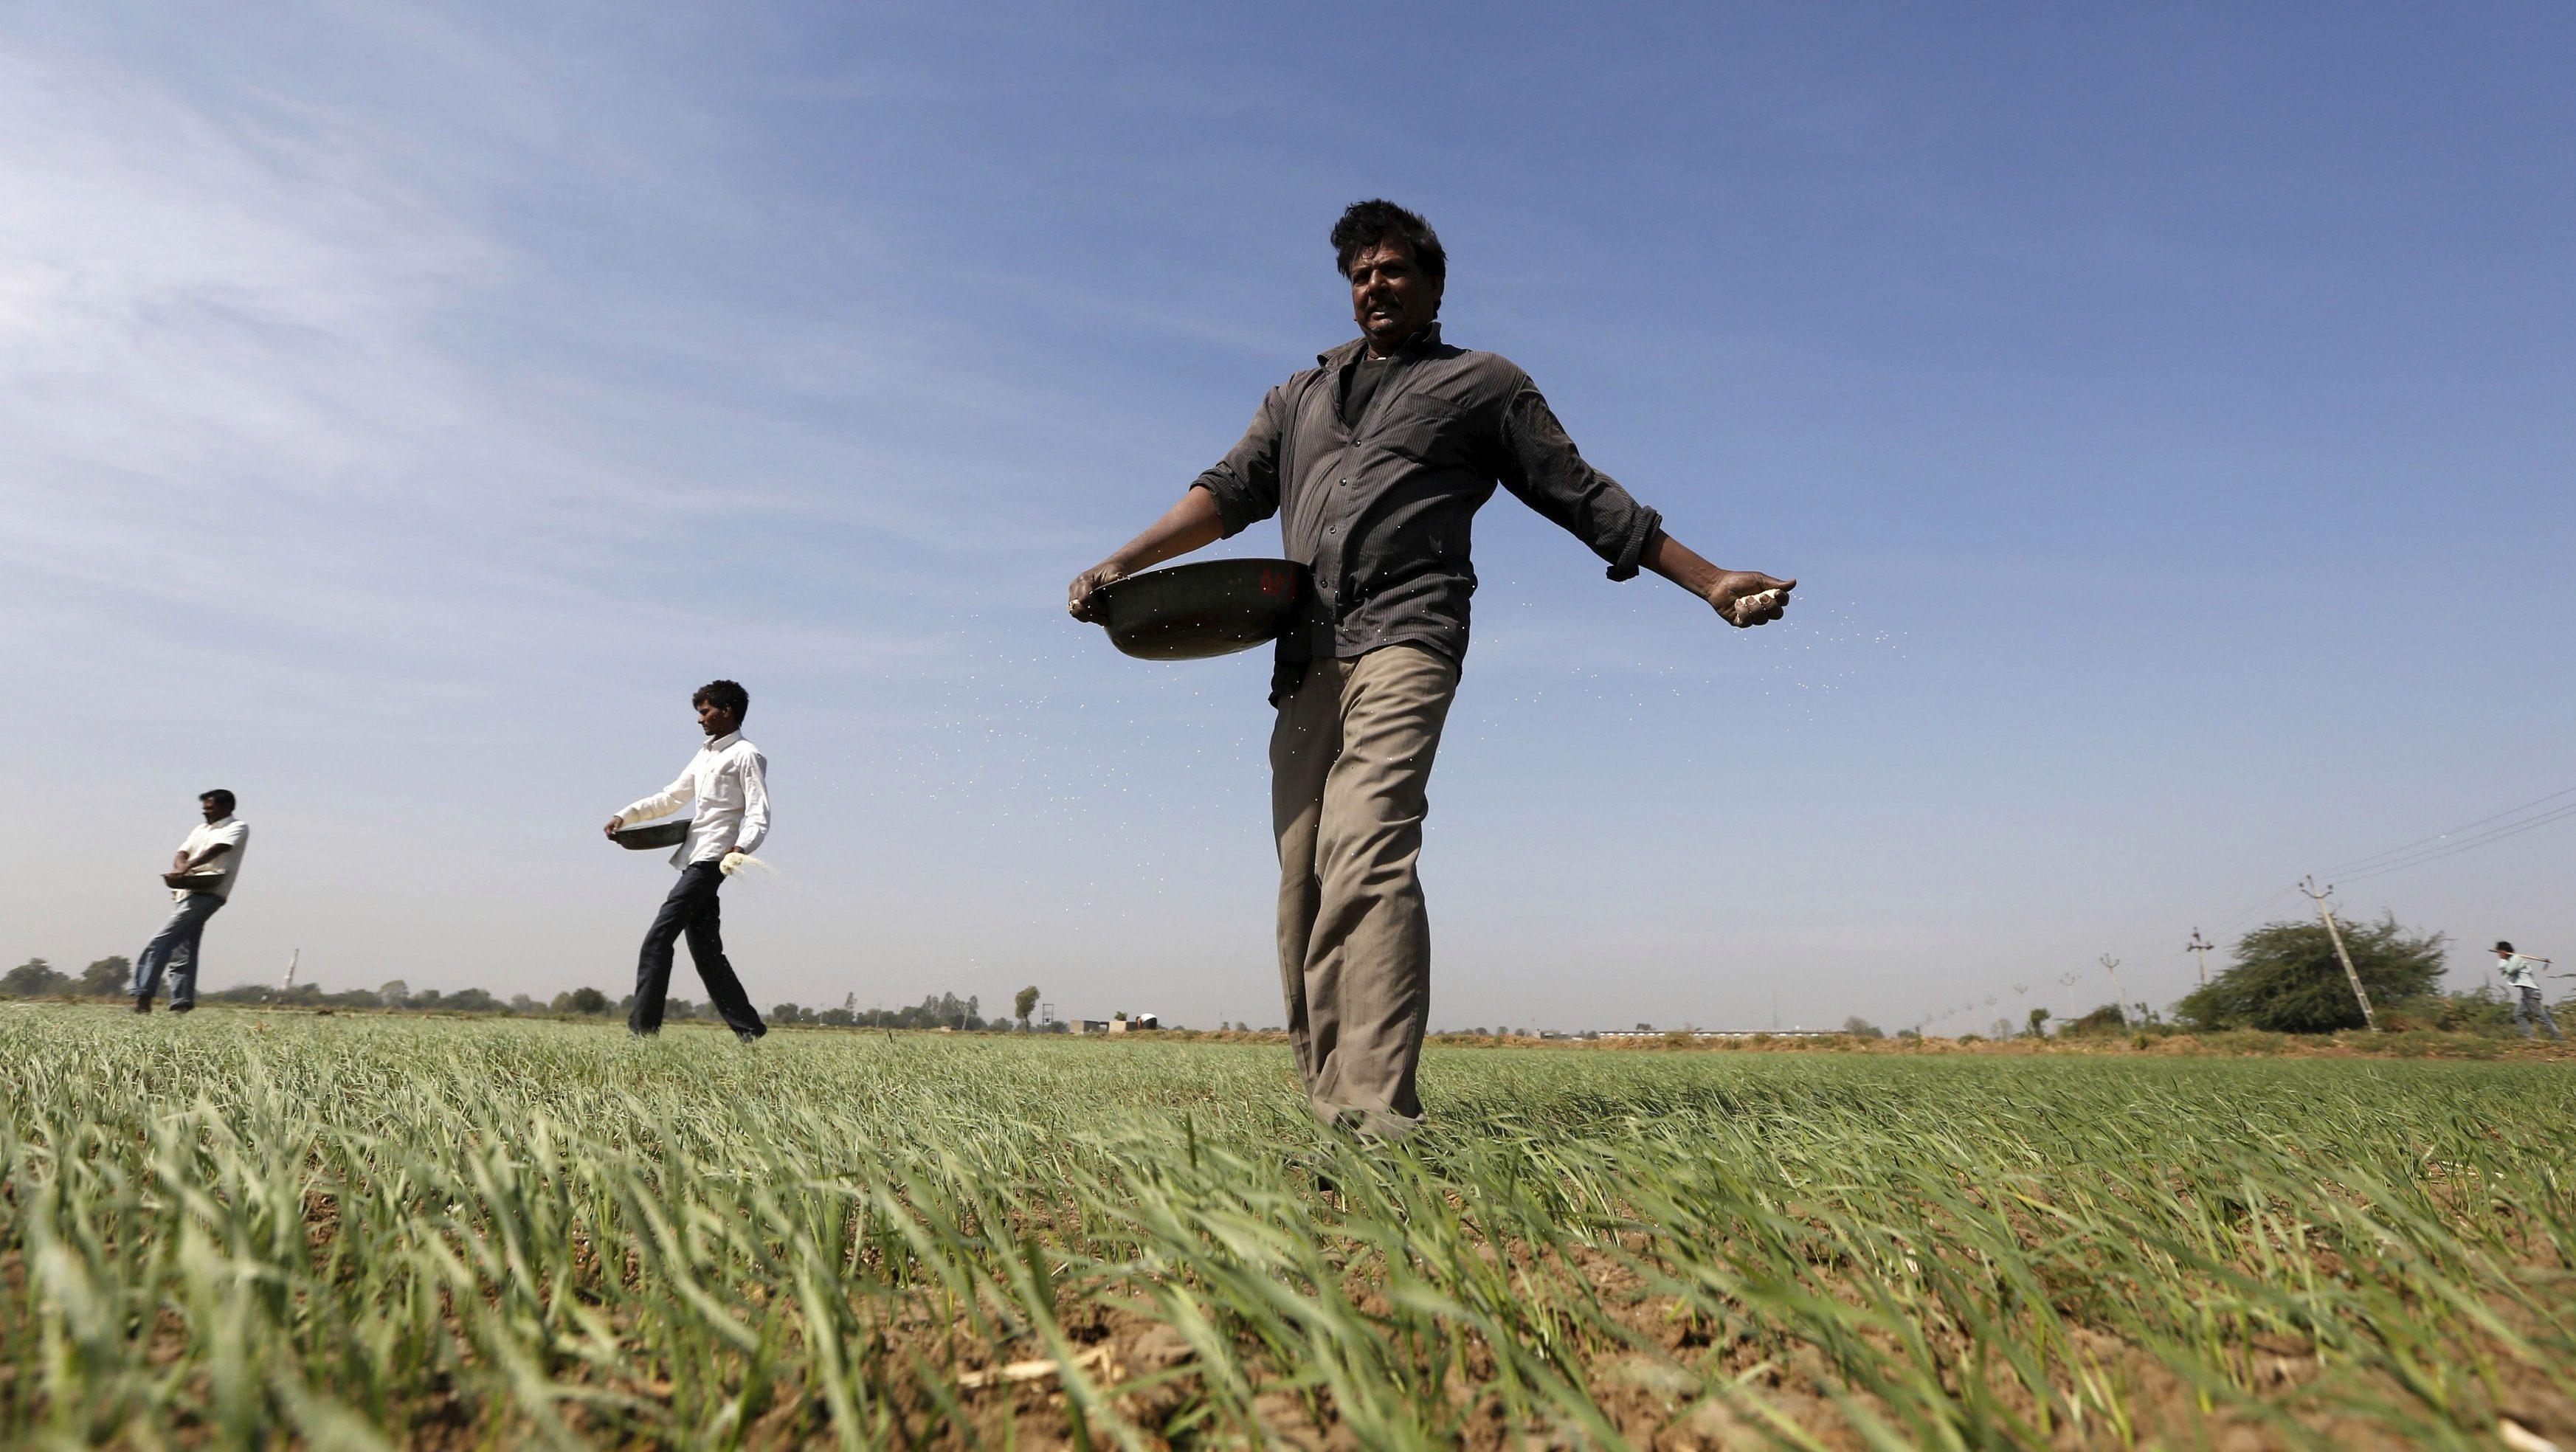 Framers-Soil-agriculture